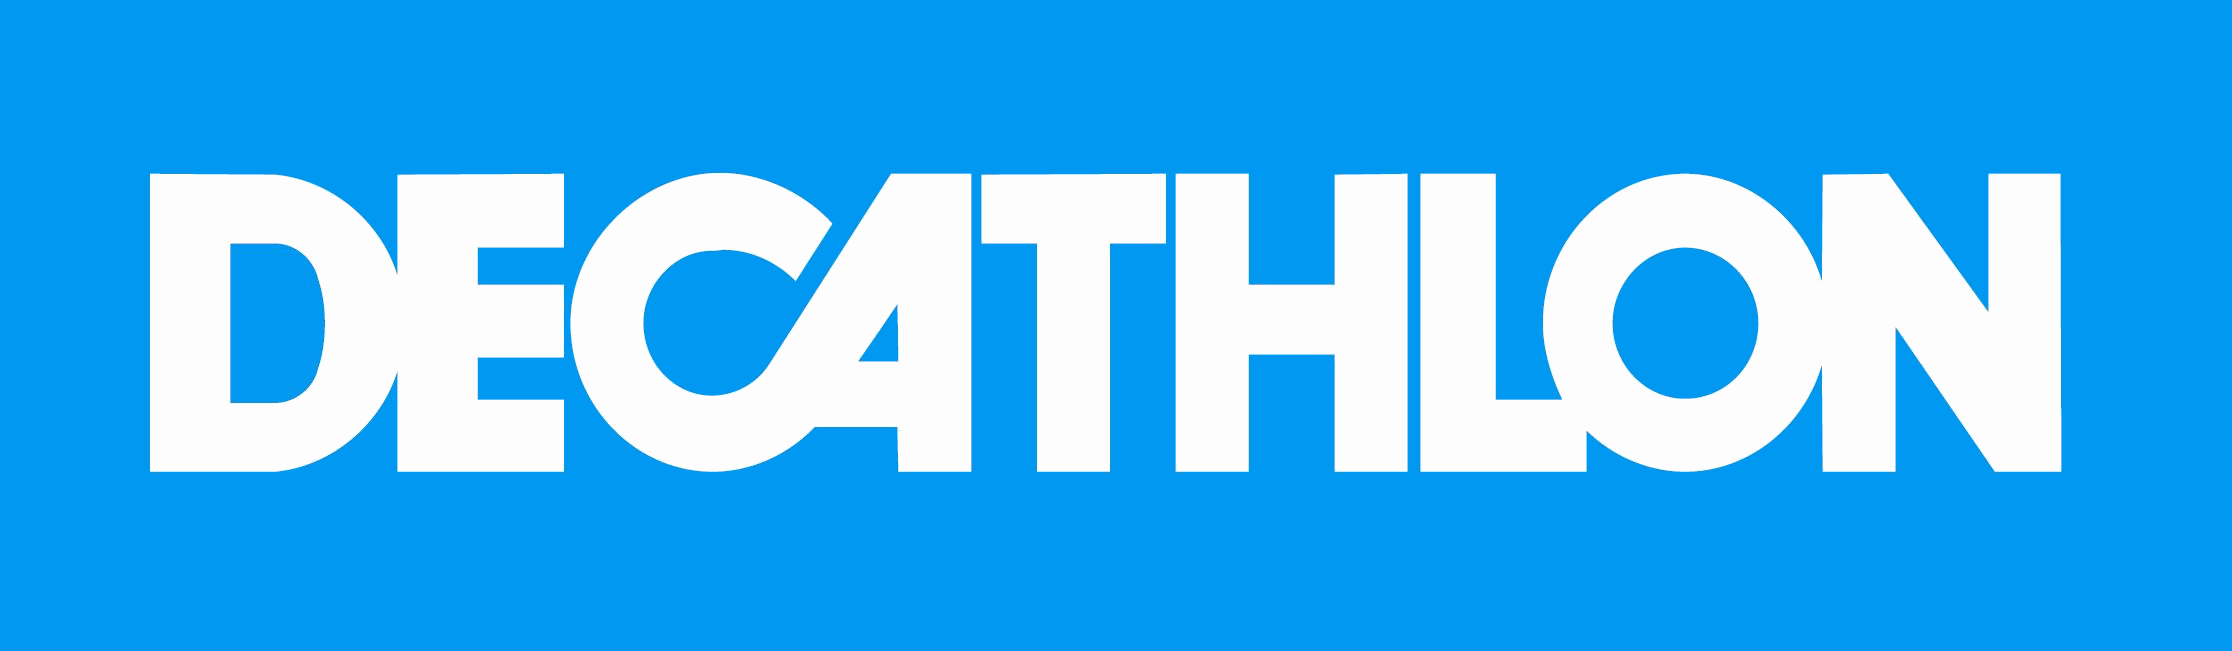 ob_96ee89_decathlon-logo.png